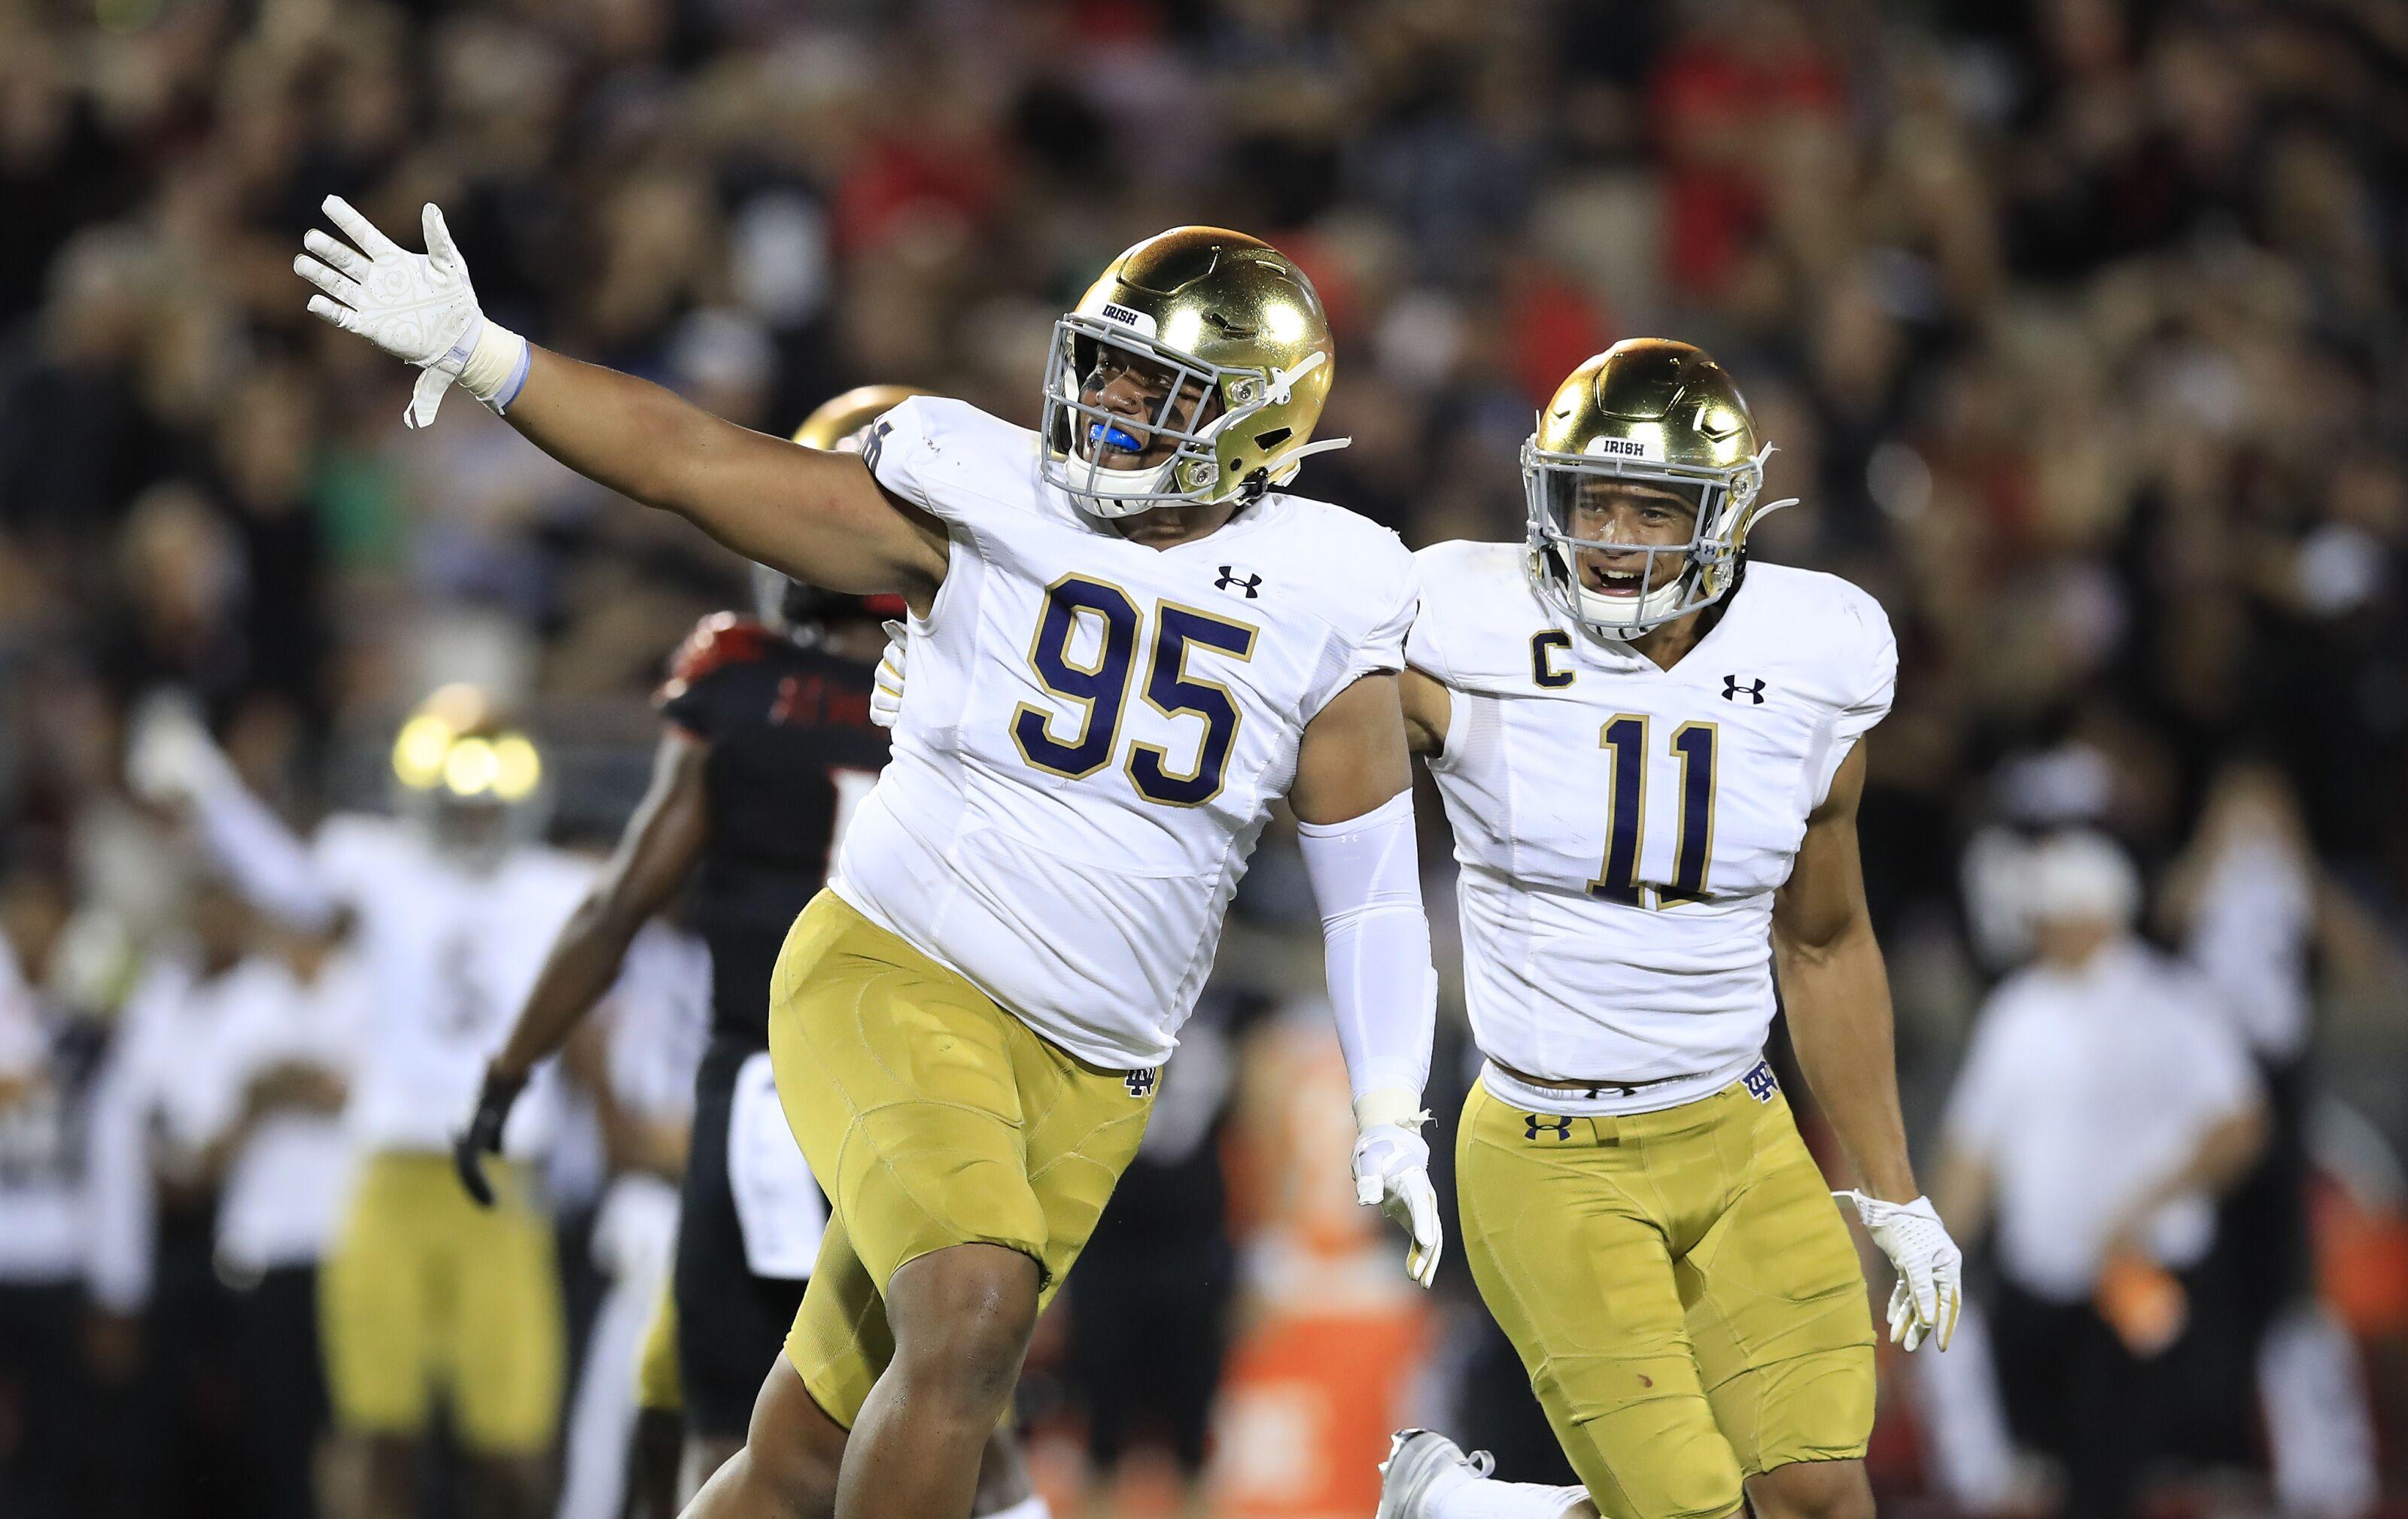 Notre Dame football looks for season-defining win over Georgia